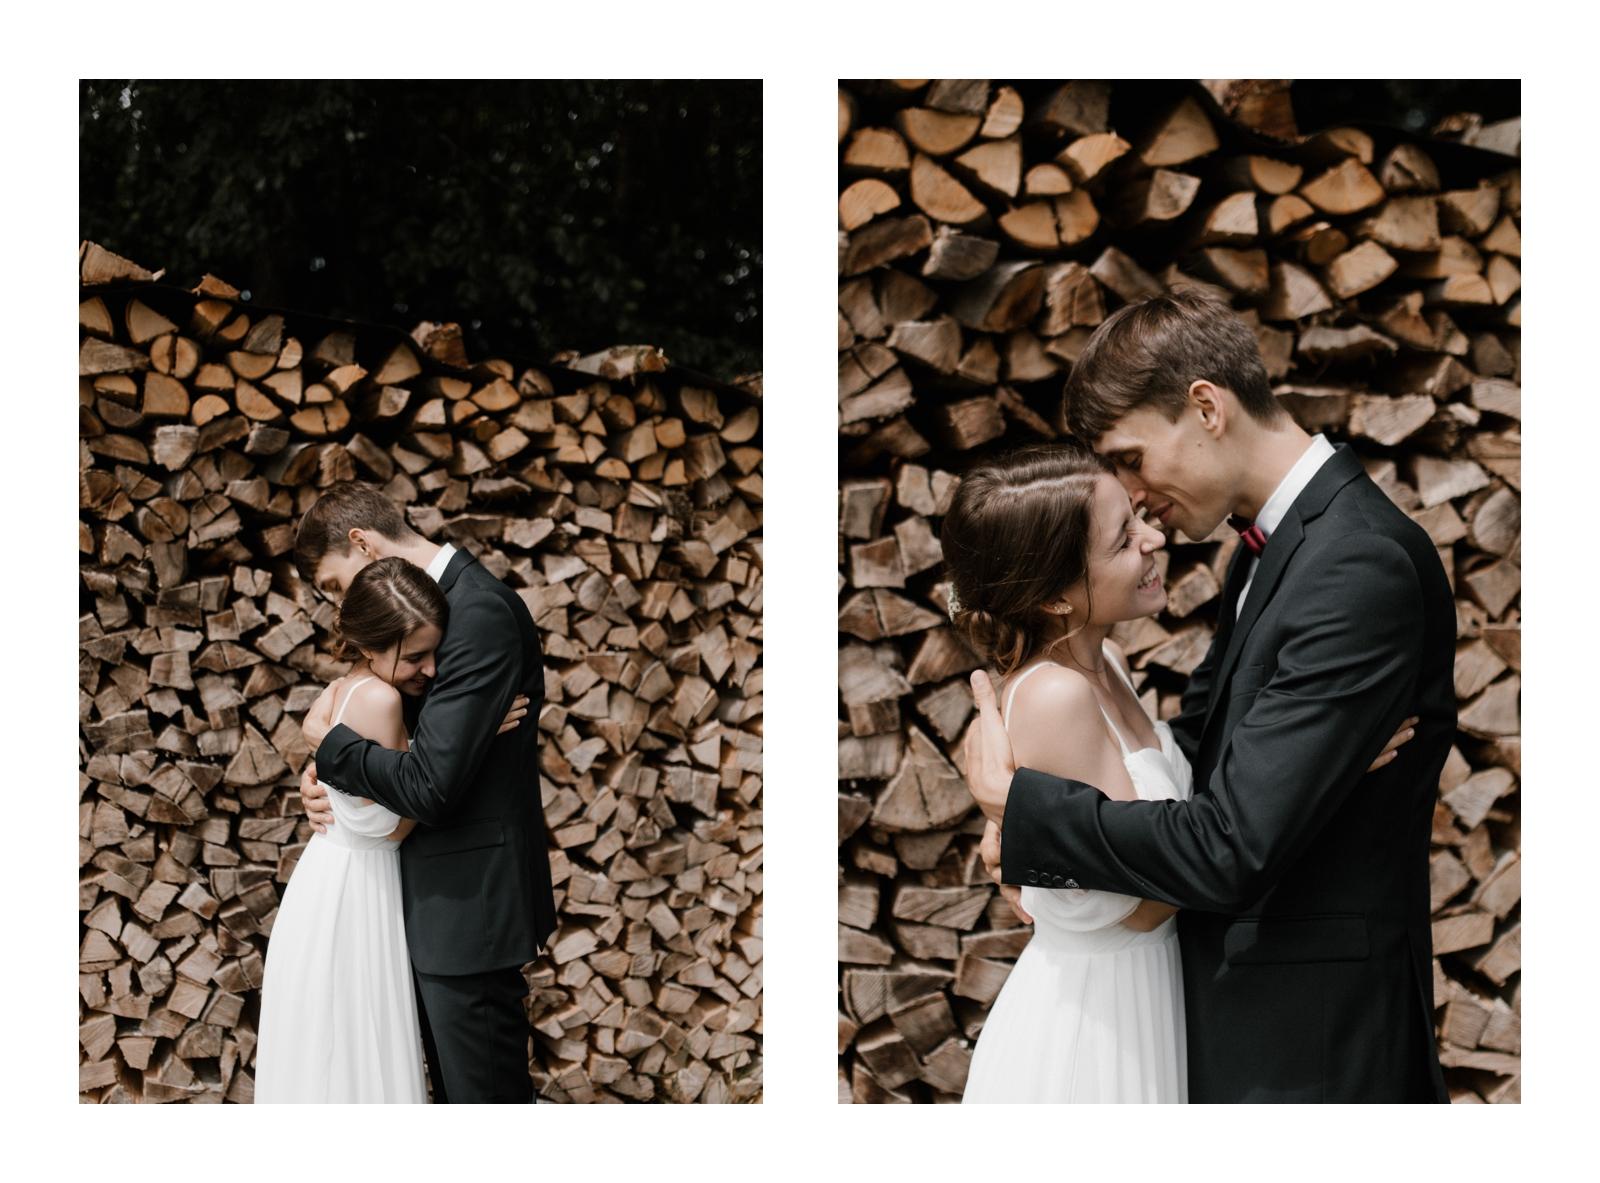 mirjam_thomas_wedding-177.jpg